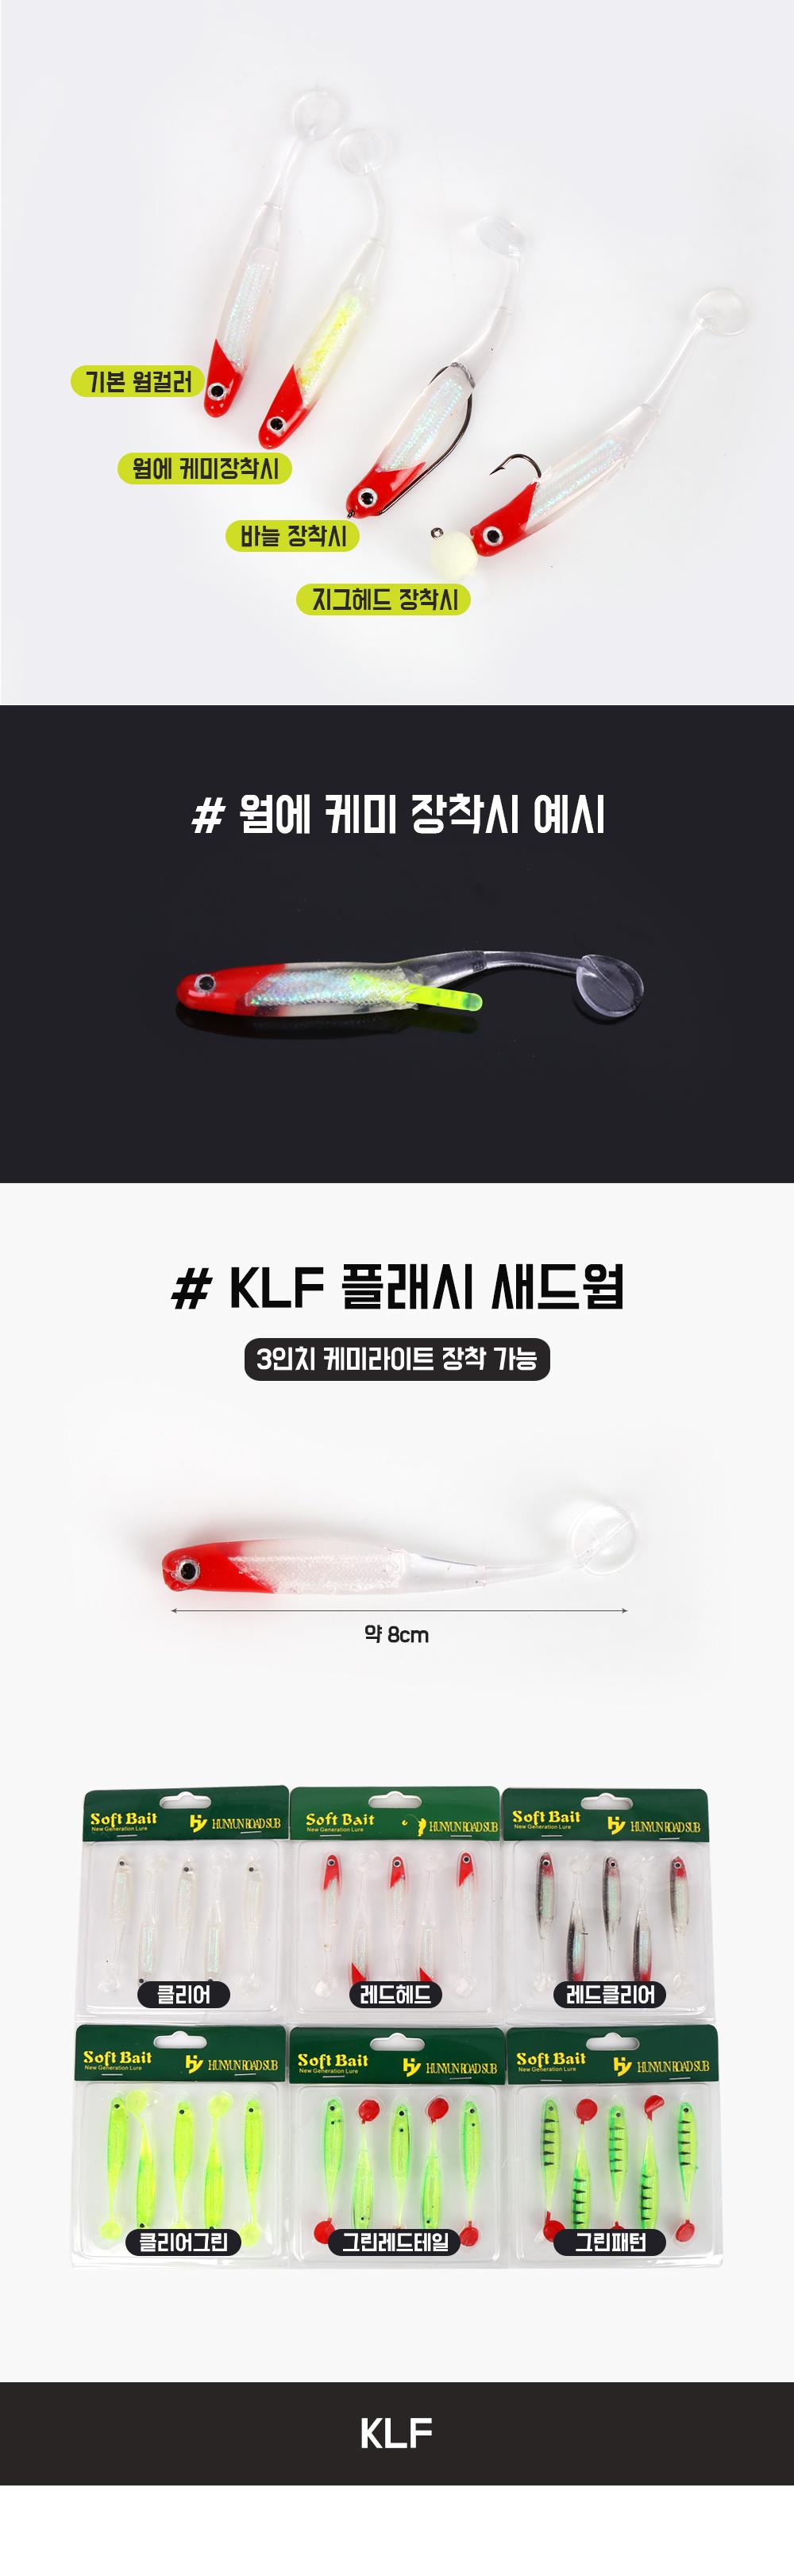 KLF 플래쉬 새드웜 3인치 케미라이트 장착 가능 광어웜 우럭웜 그럽웜 새드웜 배스웜 쉐드웜 웜 루어웜